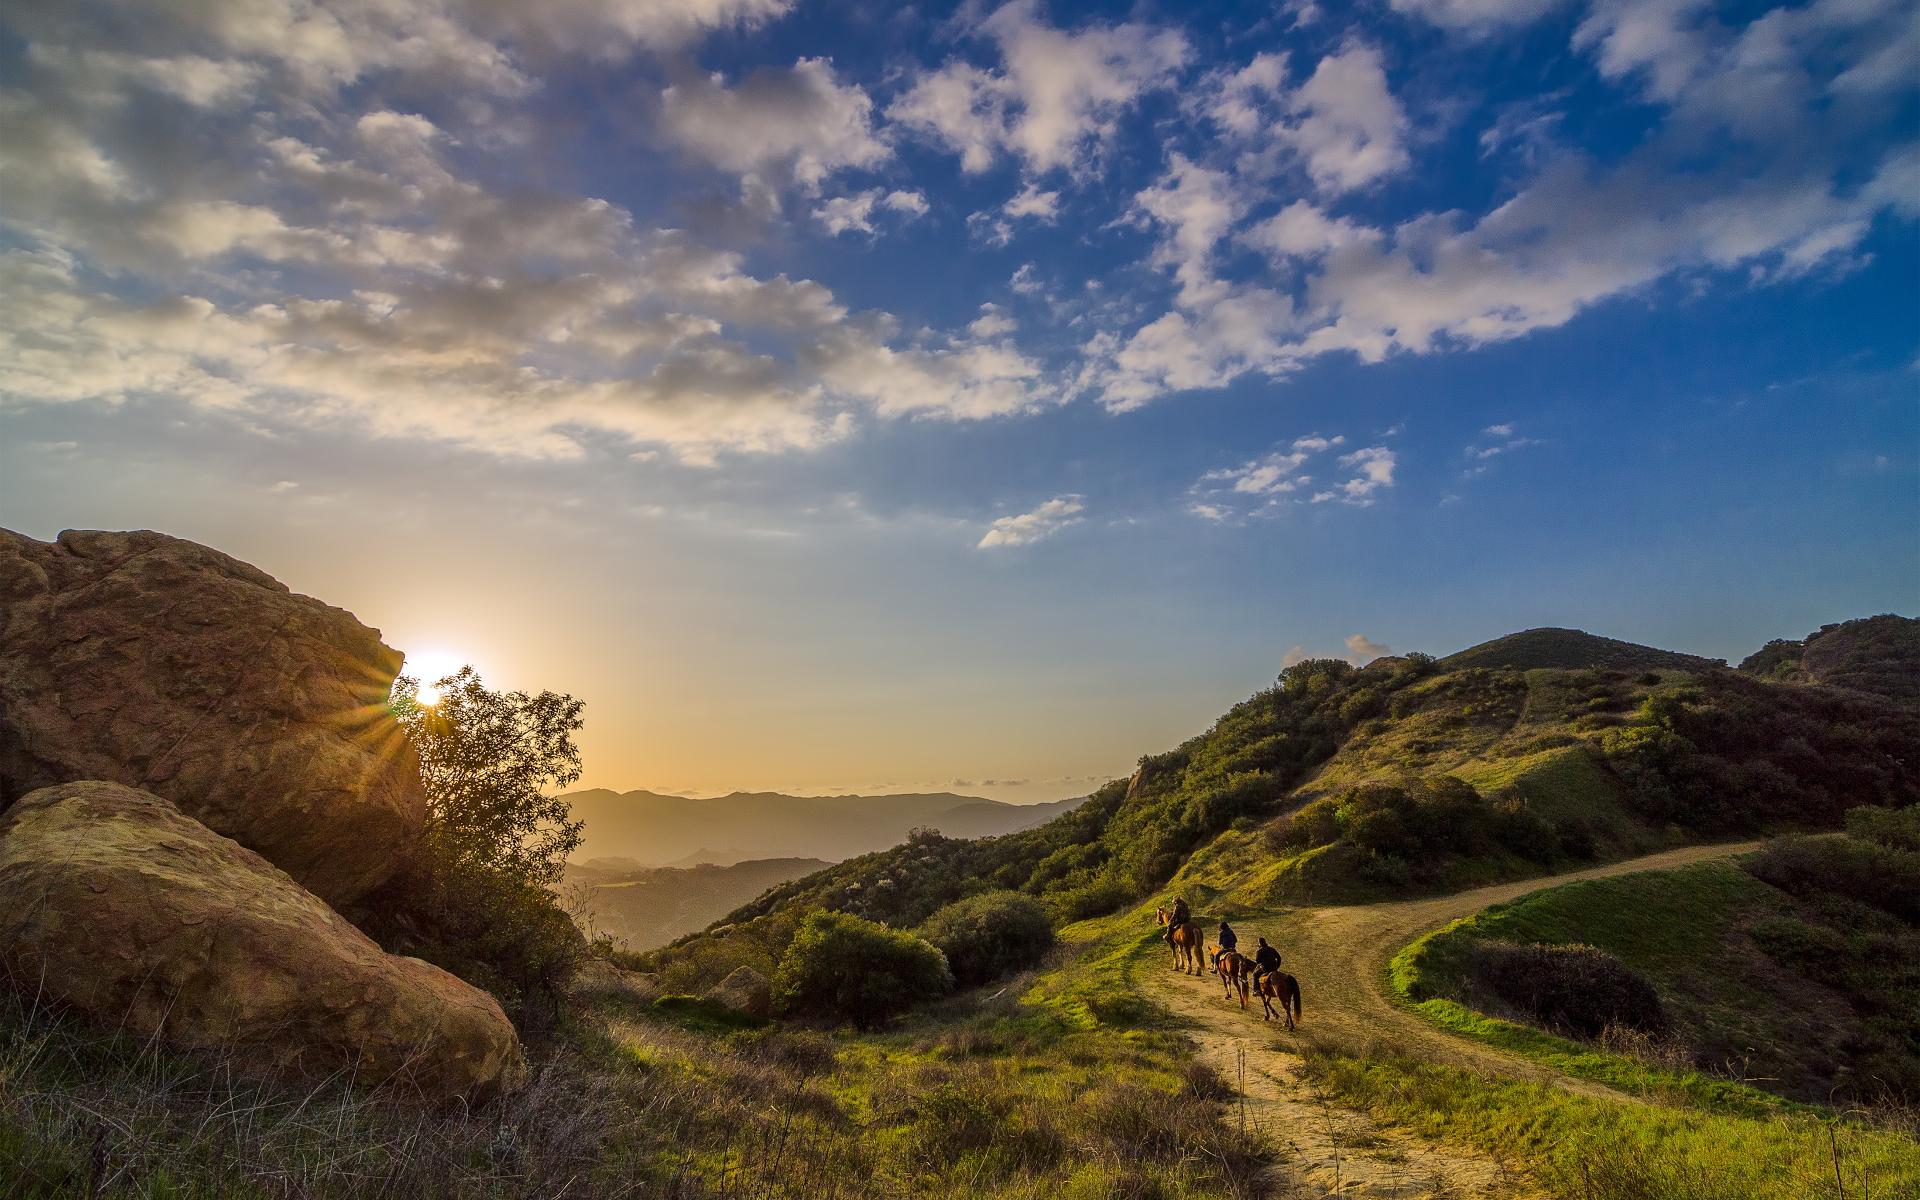 Landscape cowboys topanga